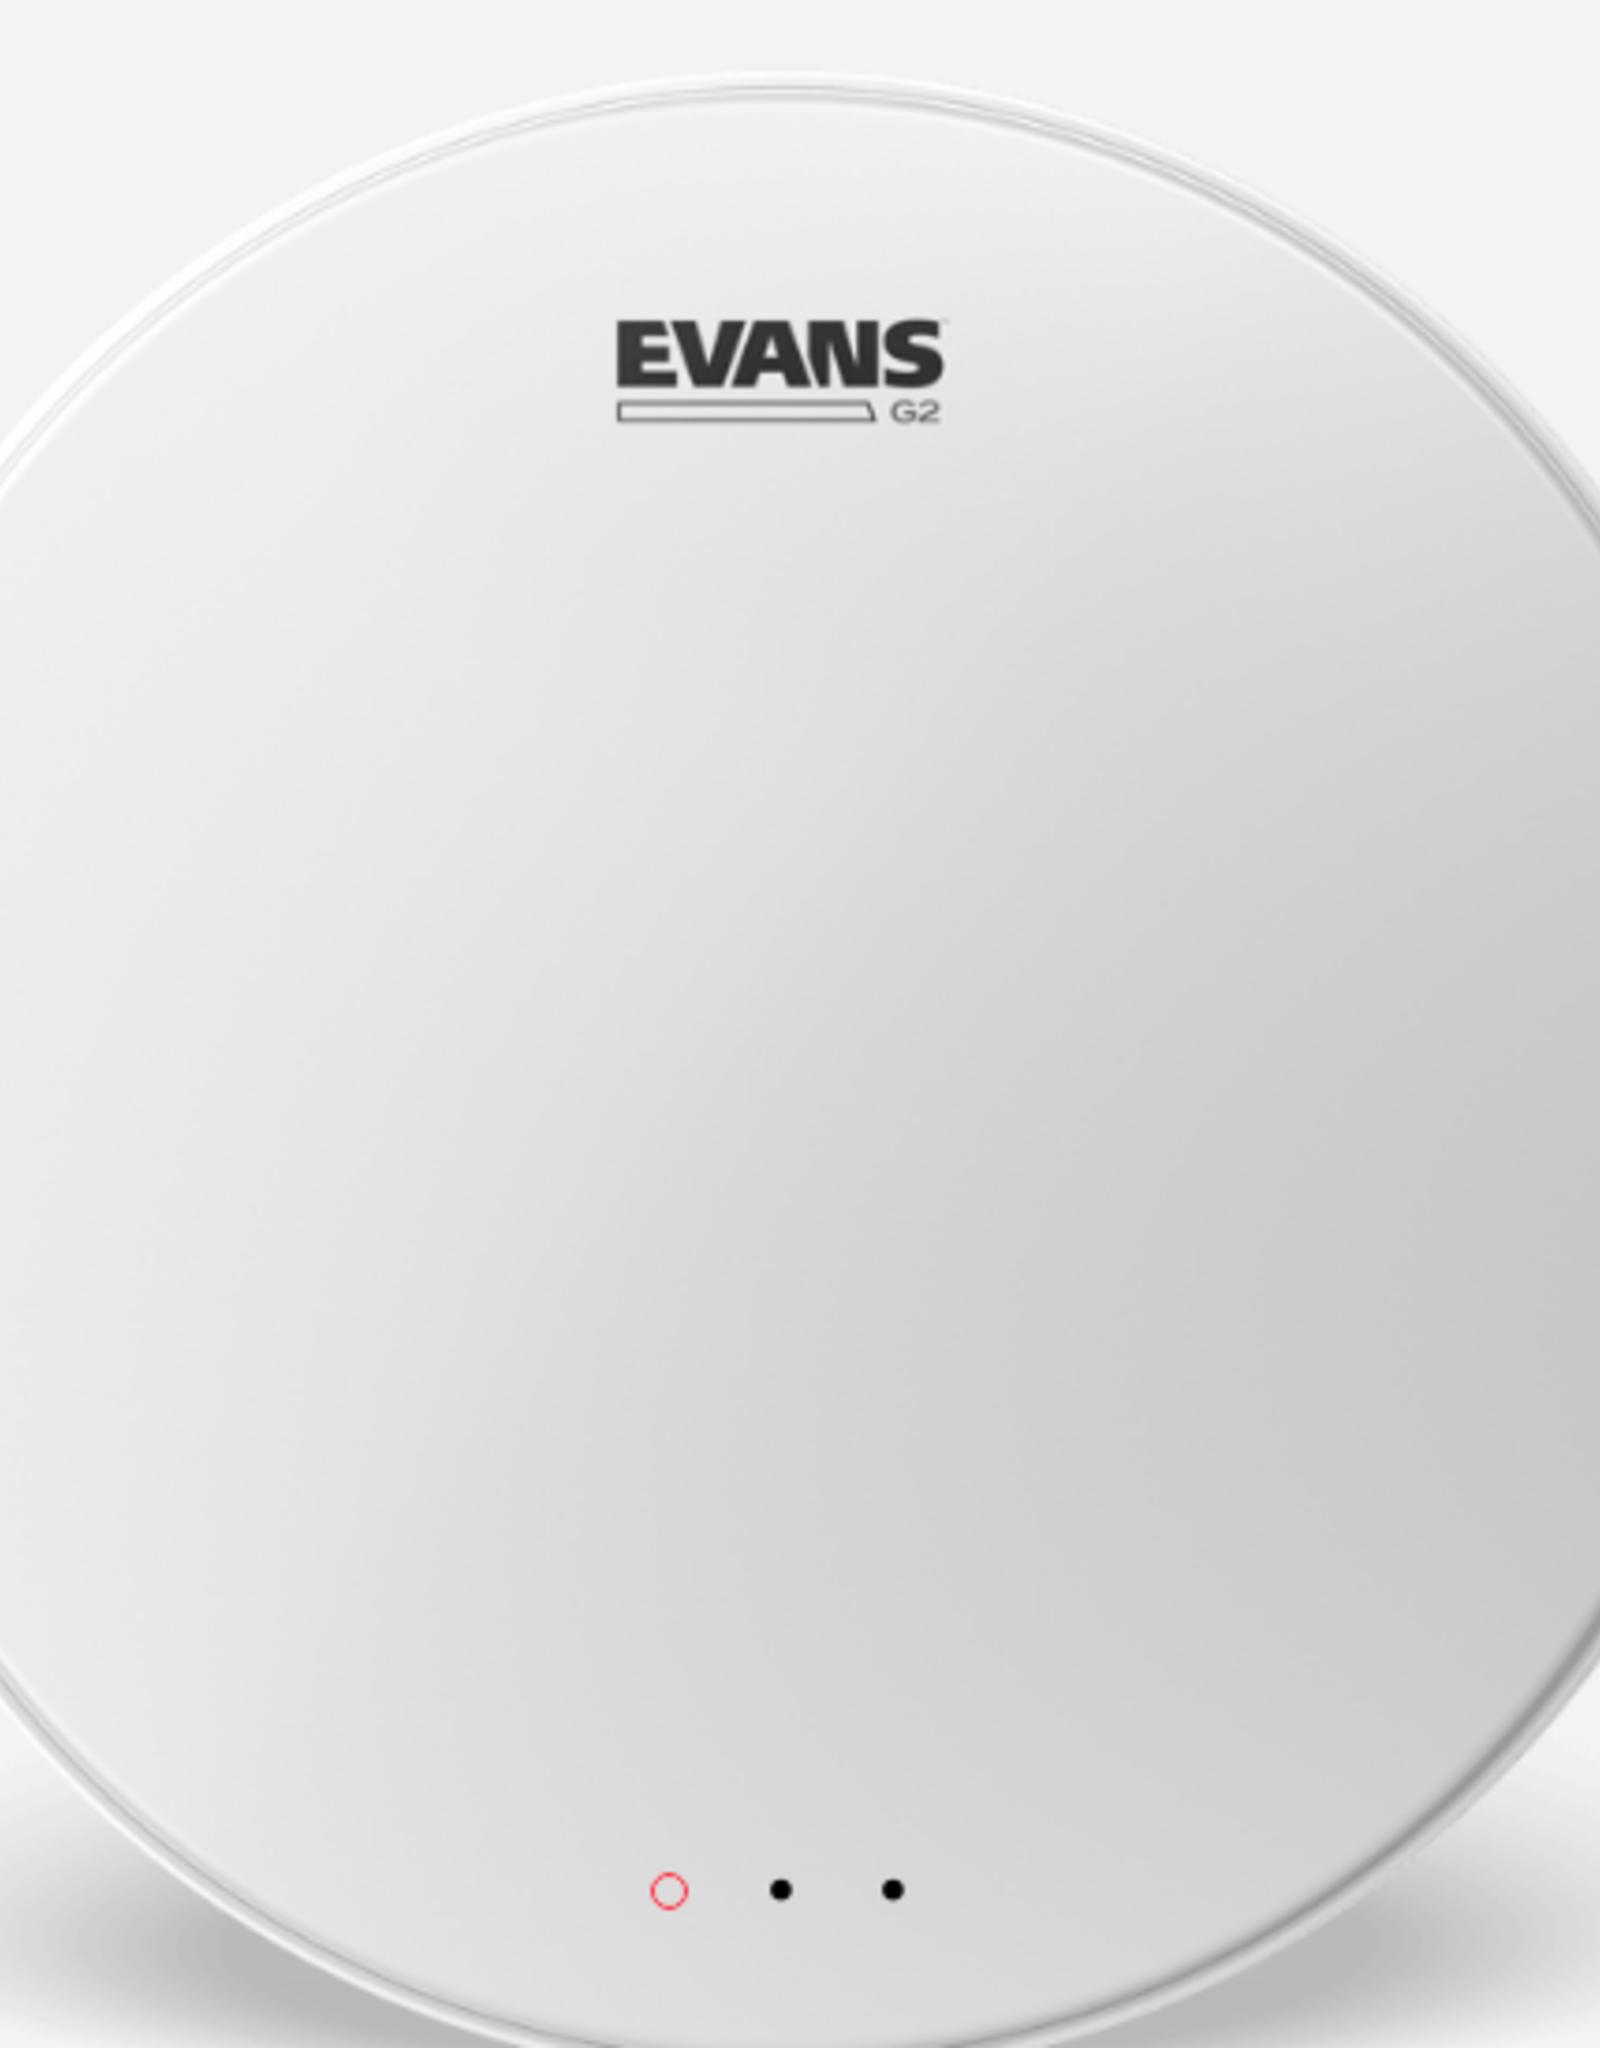 Evans Evans 12'' Coated Genera G2